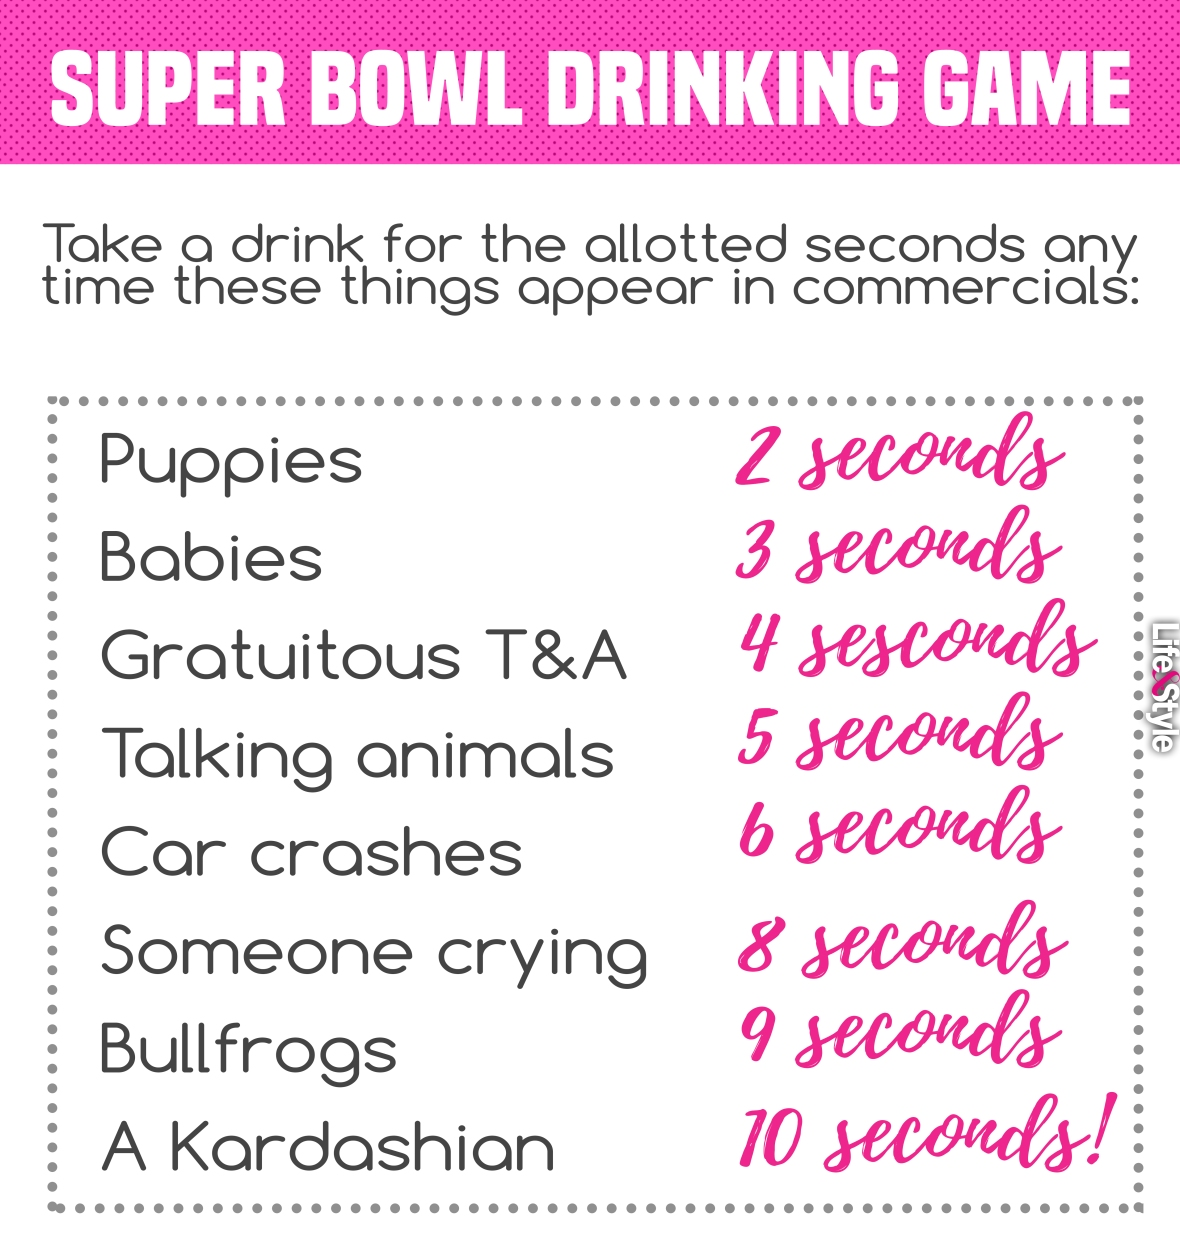 super bowl 2018 drinking game again